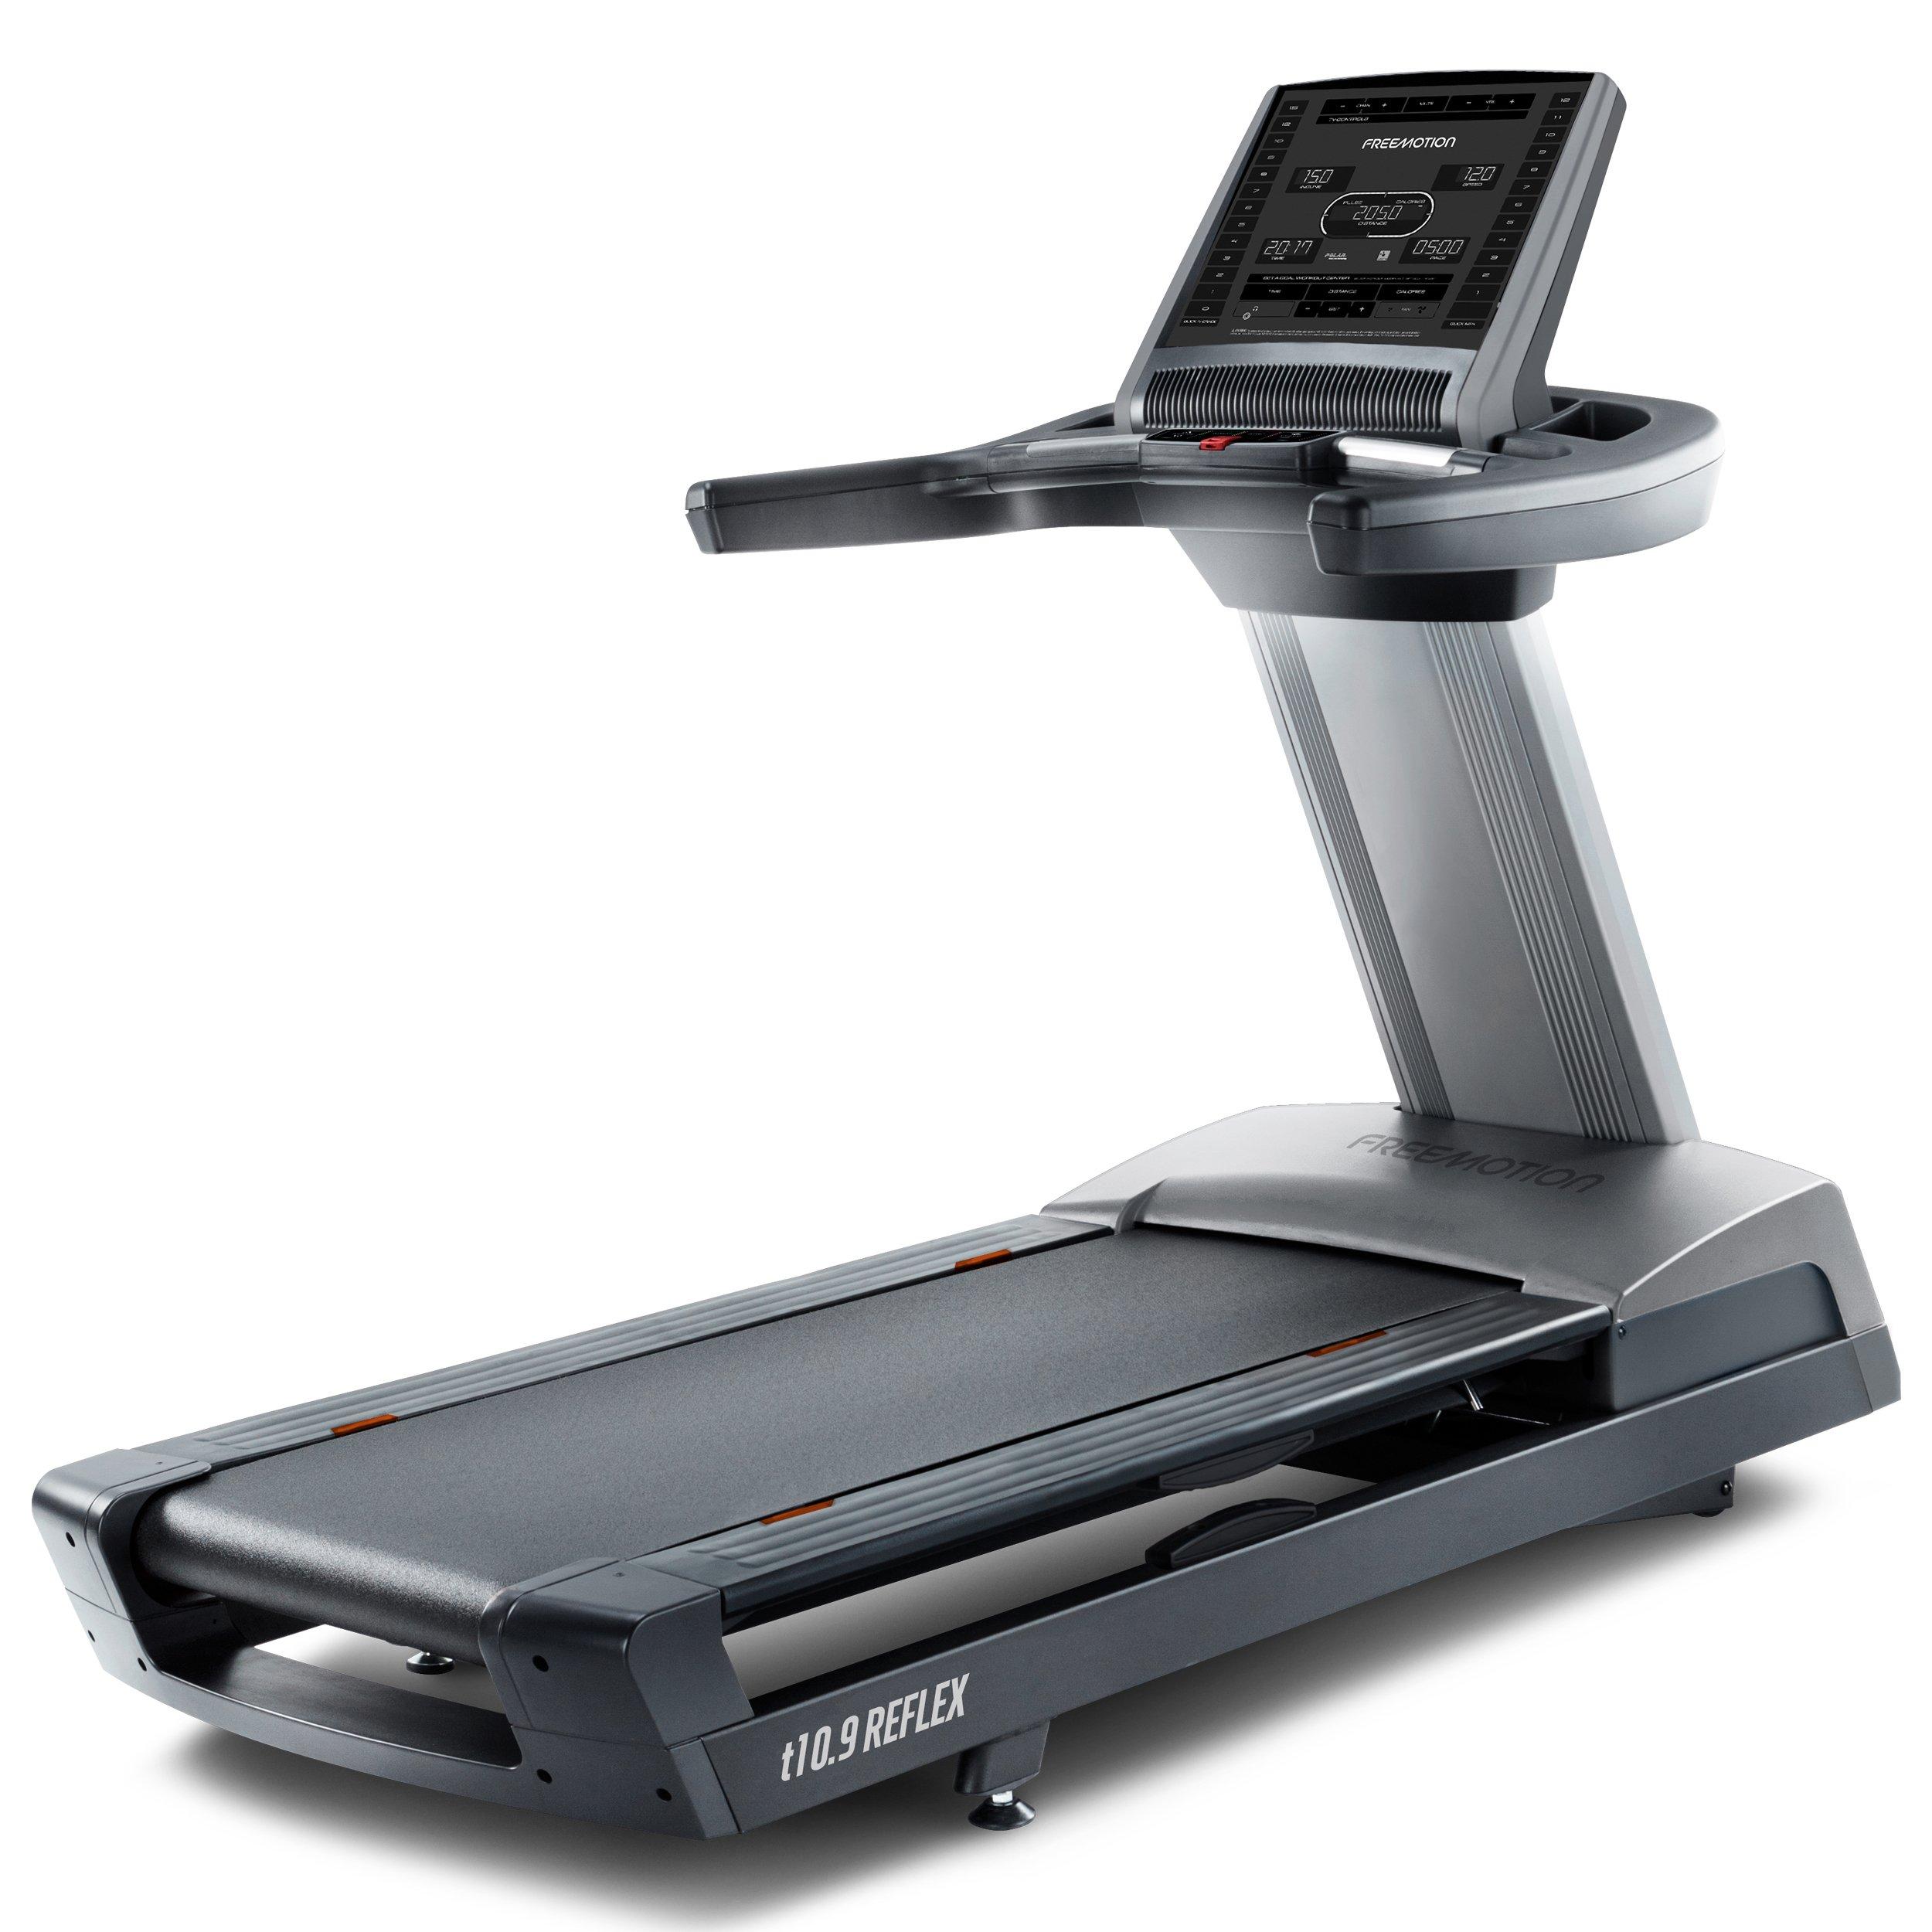 FreeMotion T10.9 Reflex Exercise Treadmill